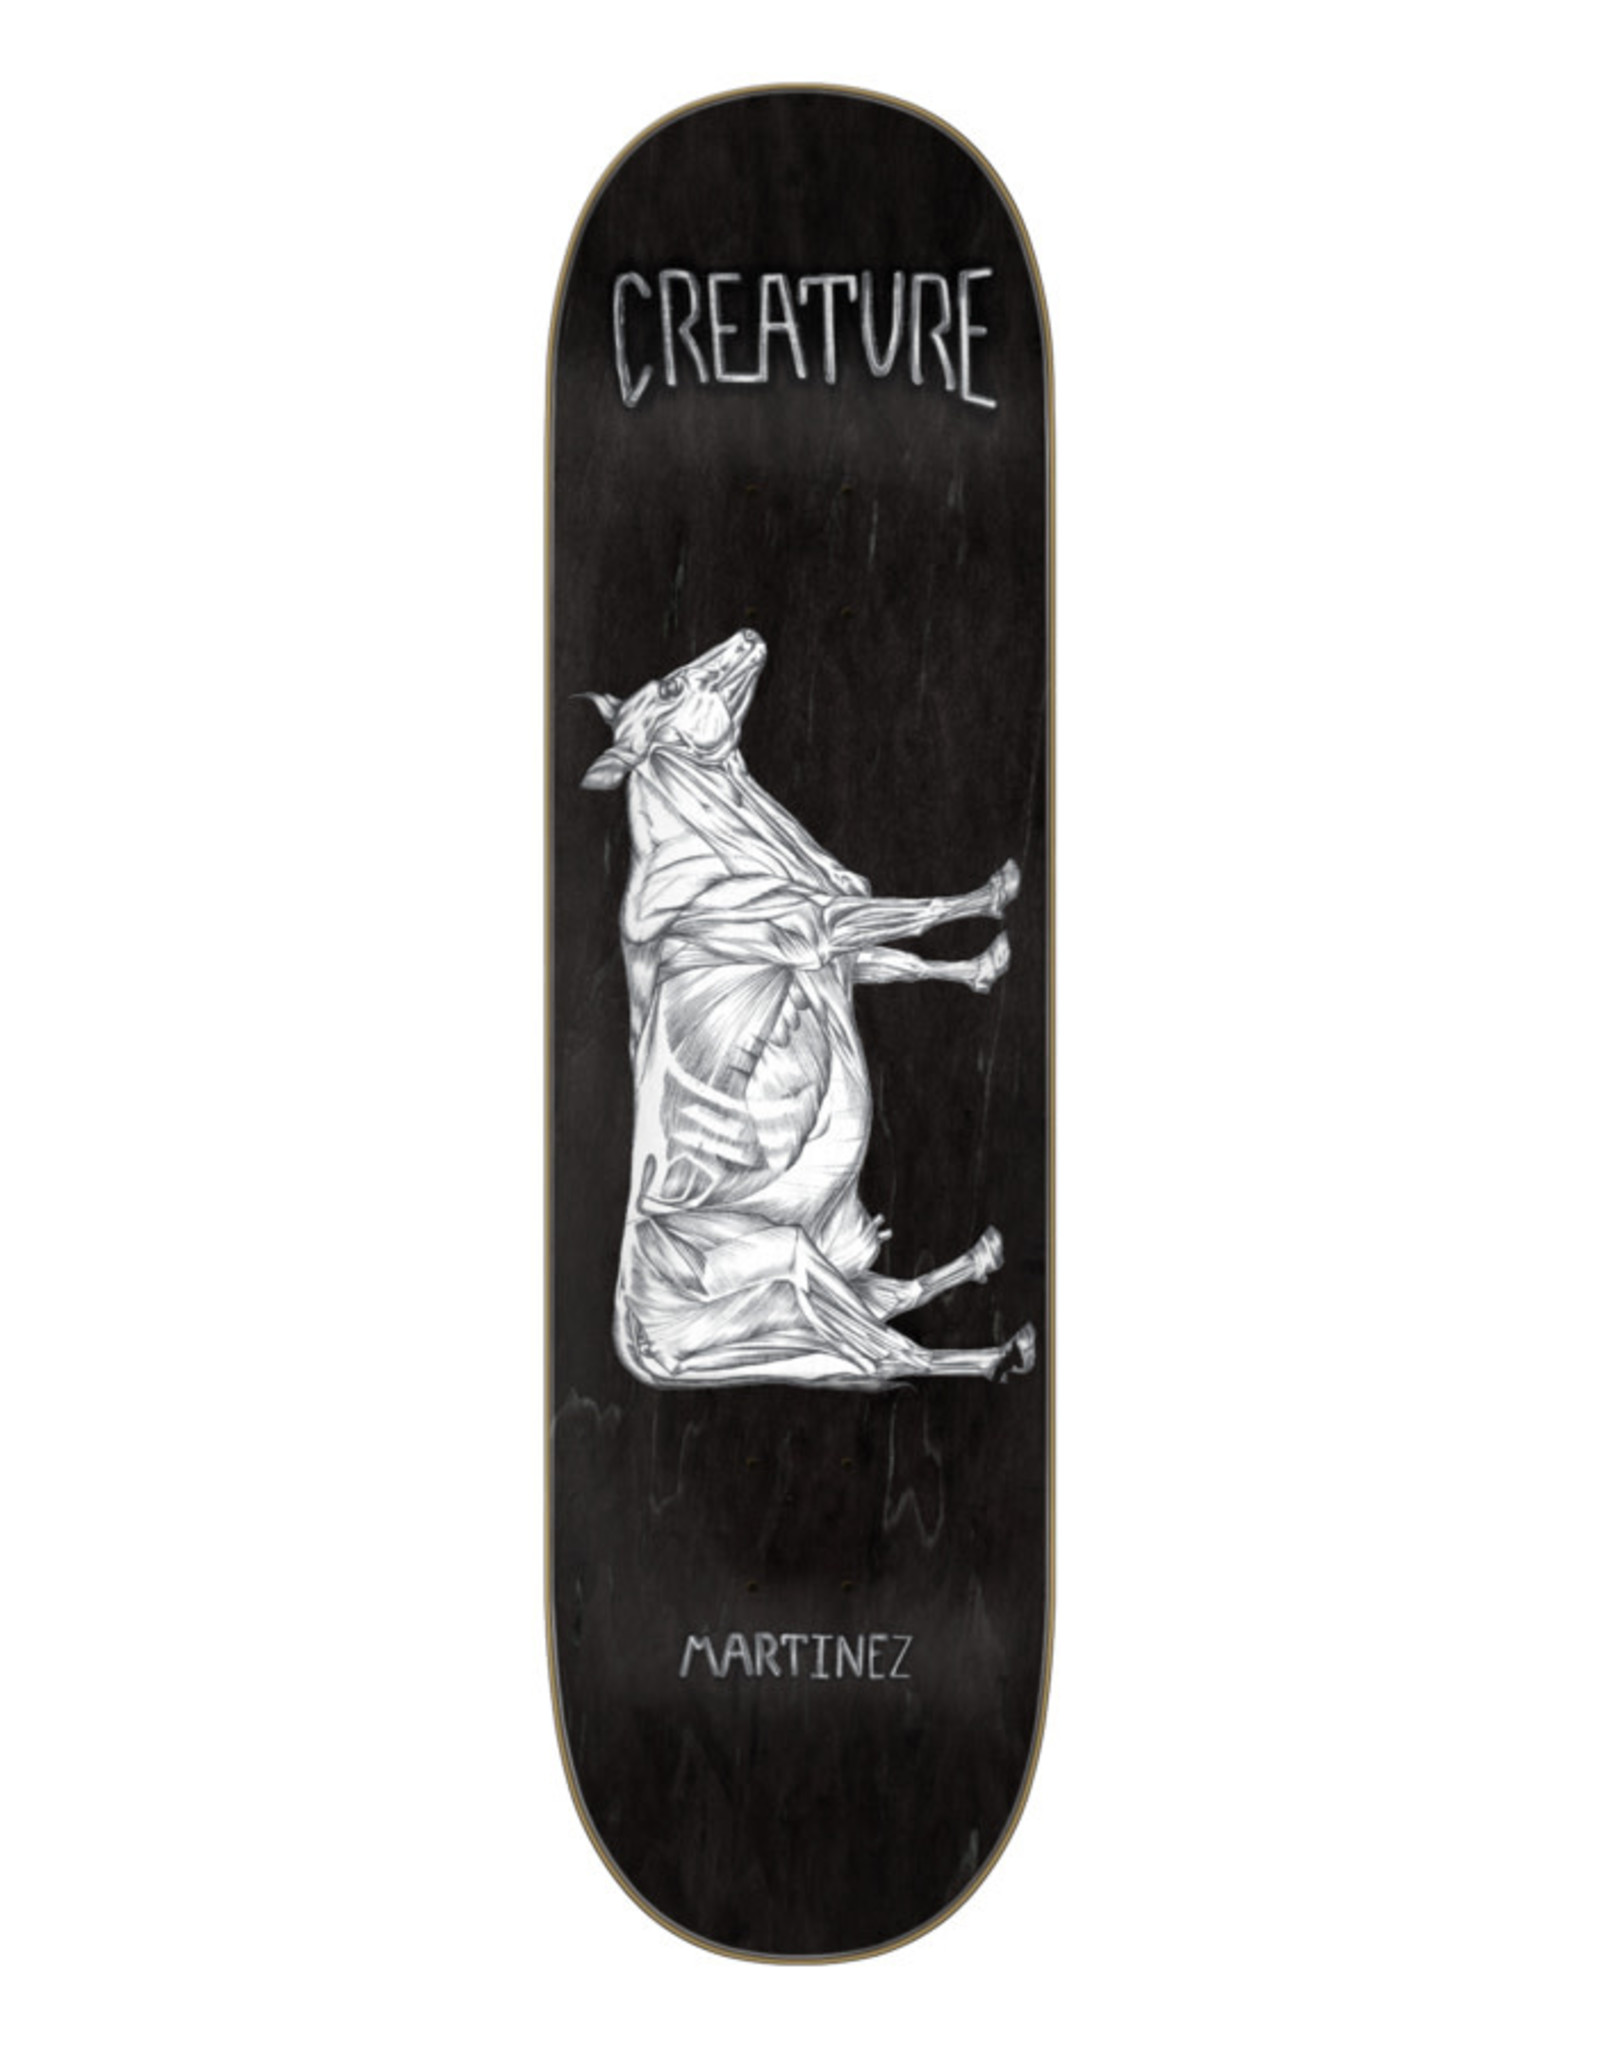 "CREATURE Martinez La Vaca Argentina Deck (8.6"")"